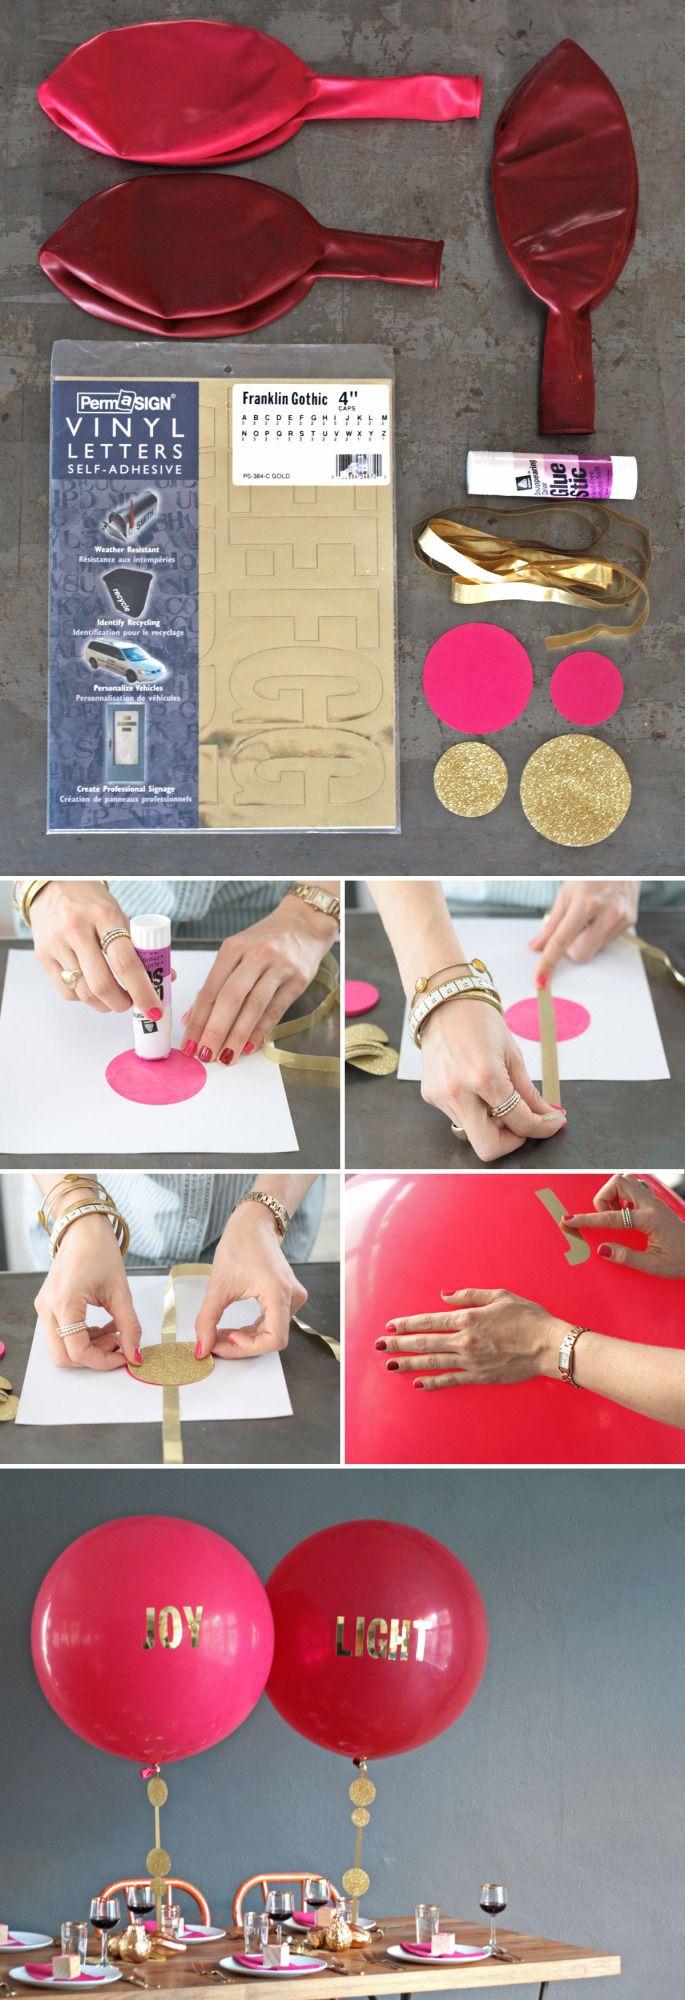 Tutorial para decorar globos gigantes con letras. #ManualidadesParaFiestas